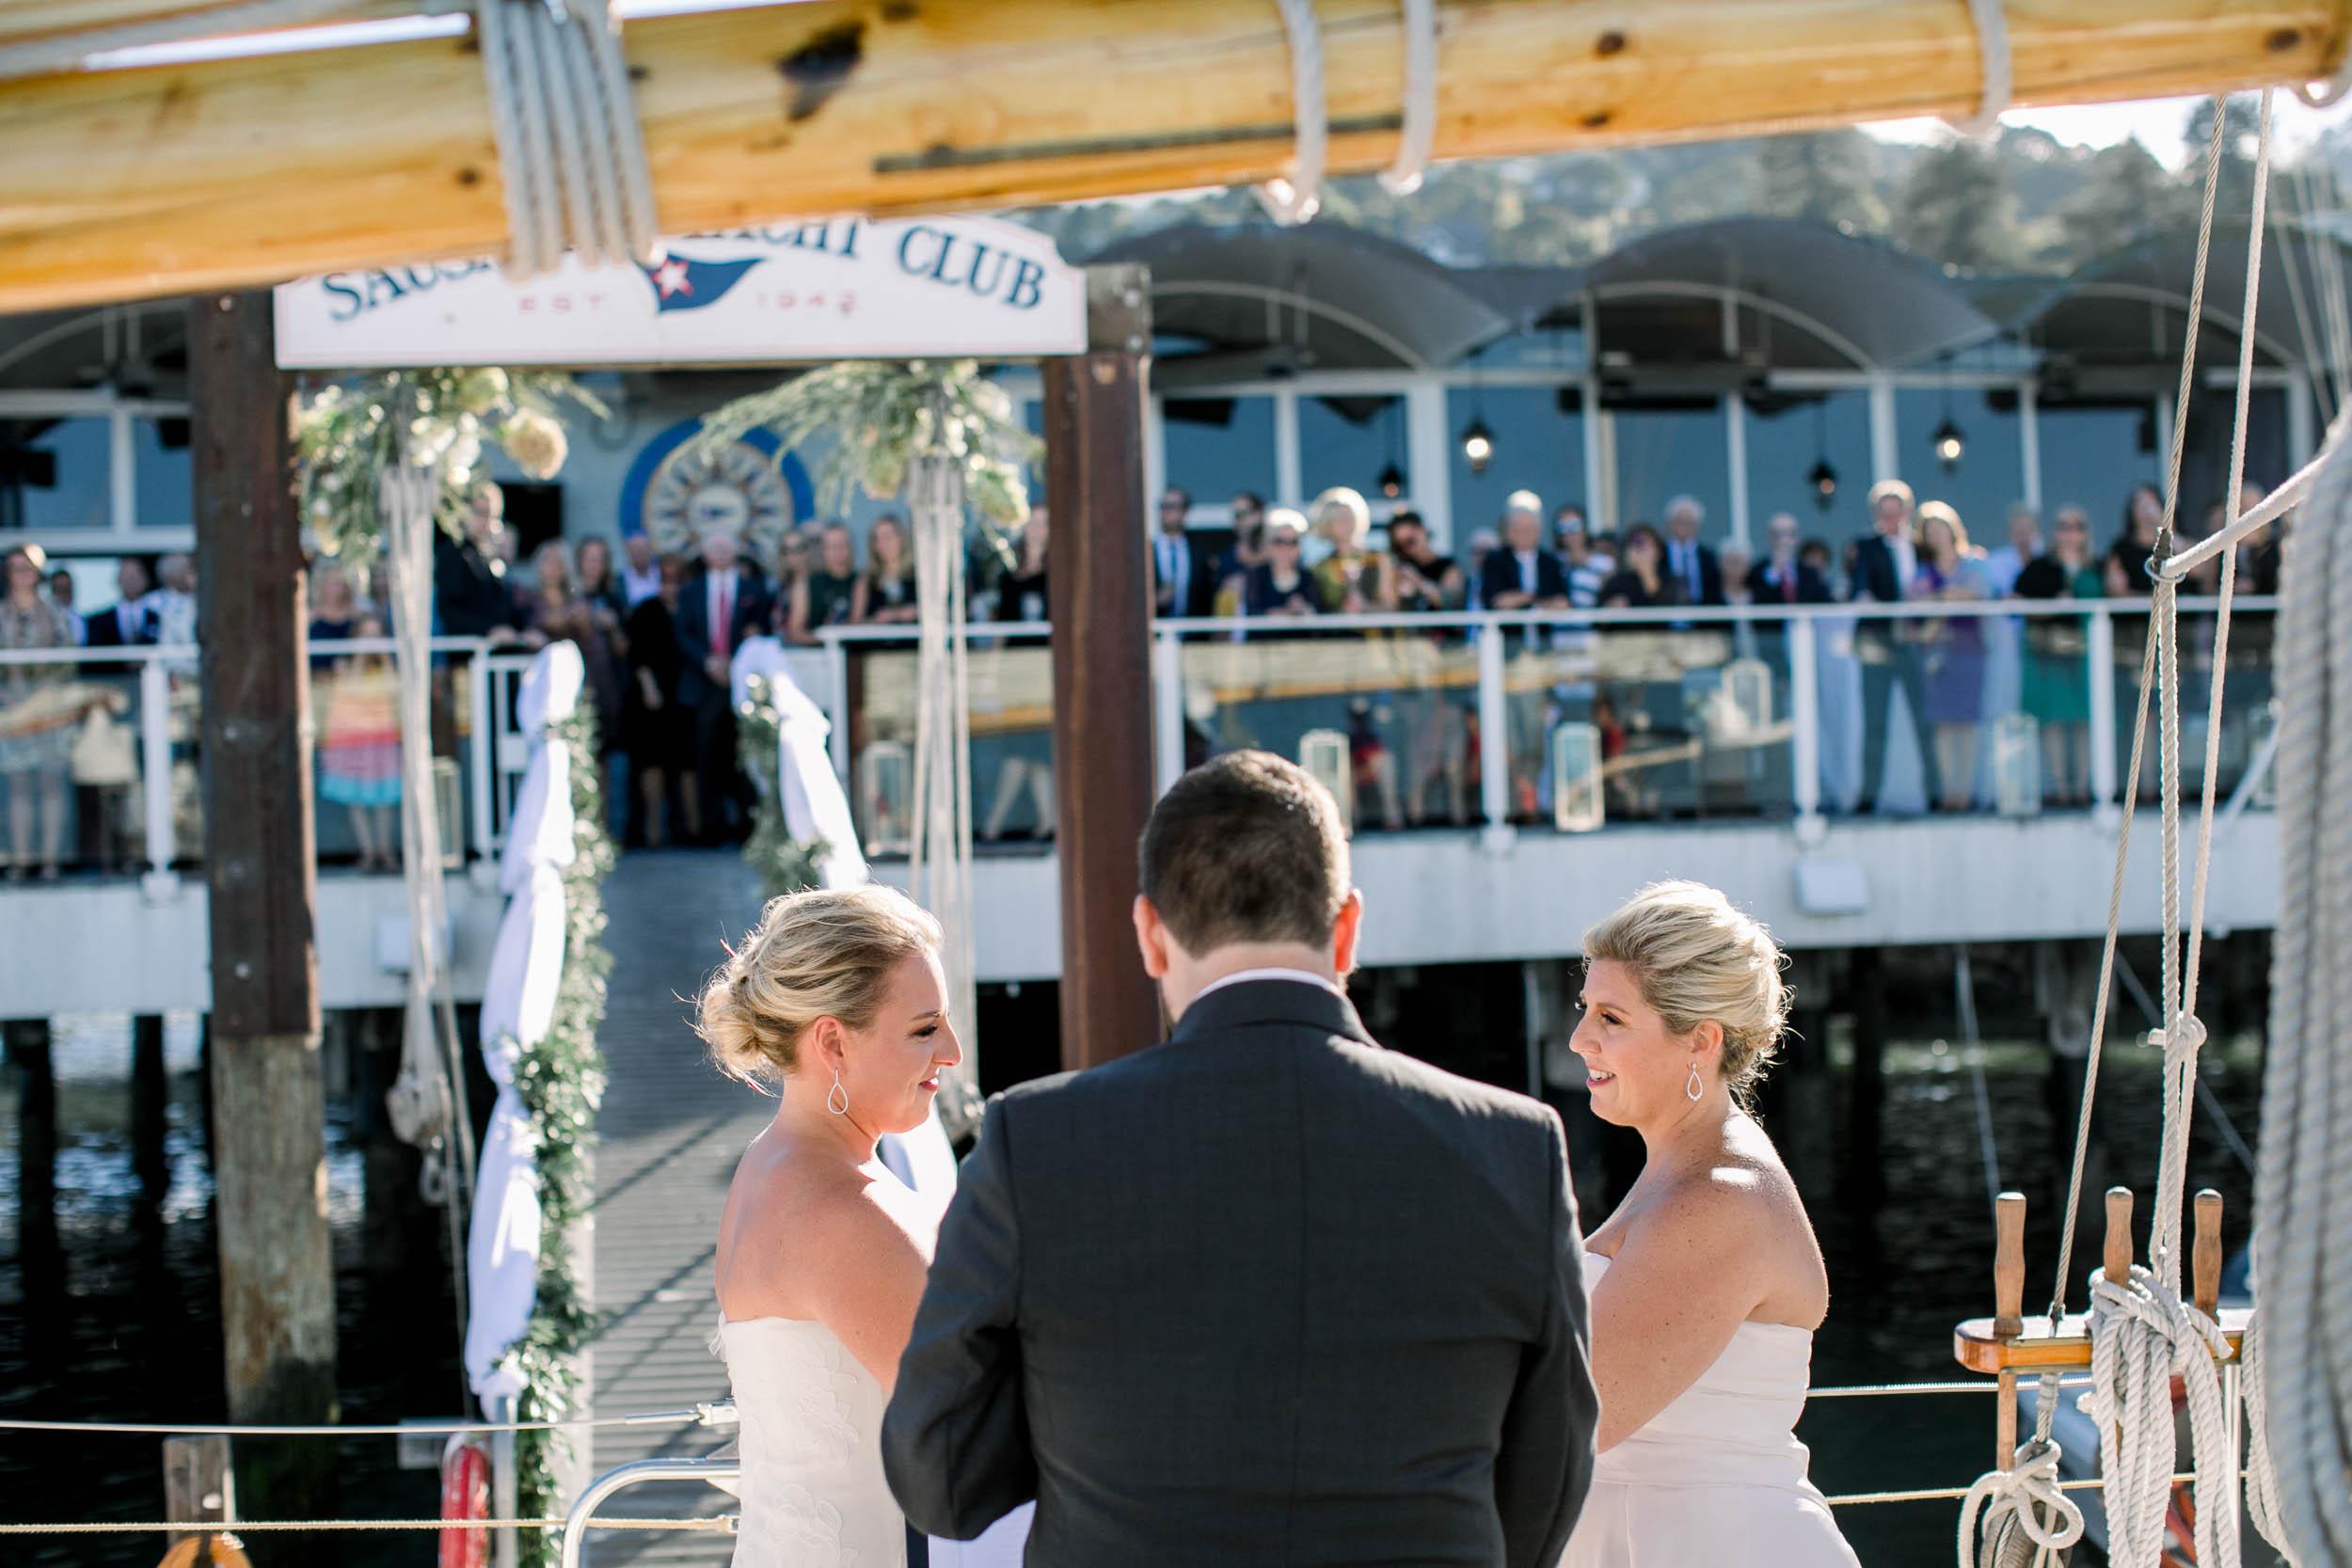 092218ER513_Sausalito Yacht Club Wedding_Buena Lane Photography.jpg